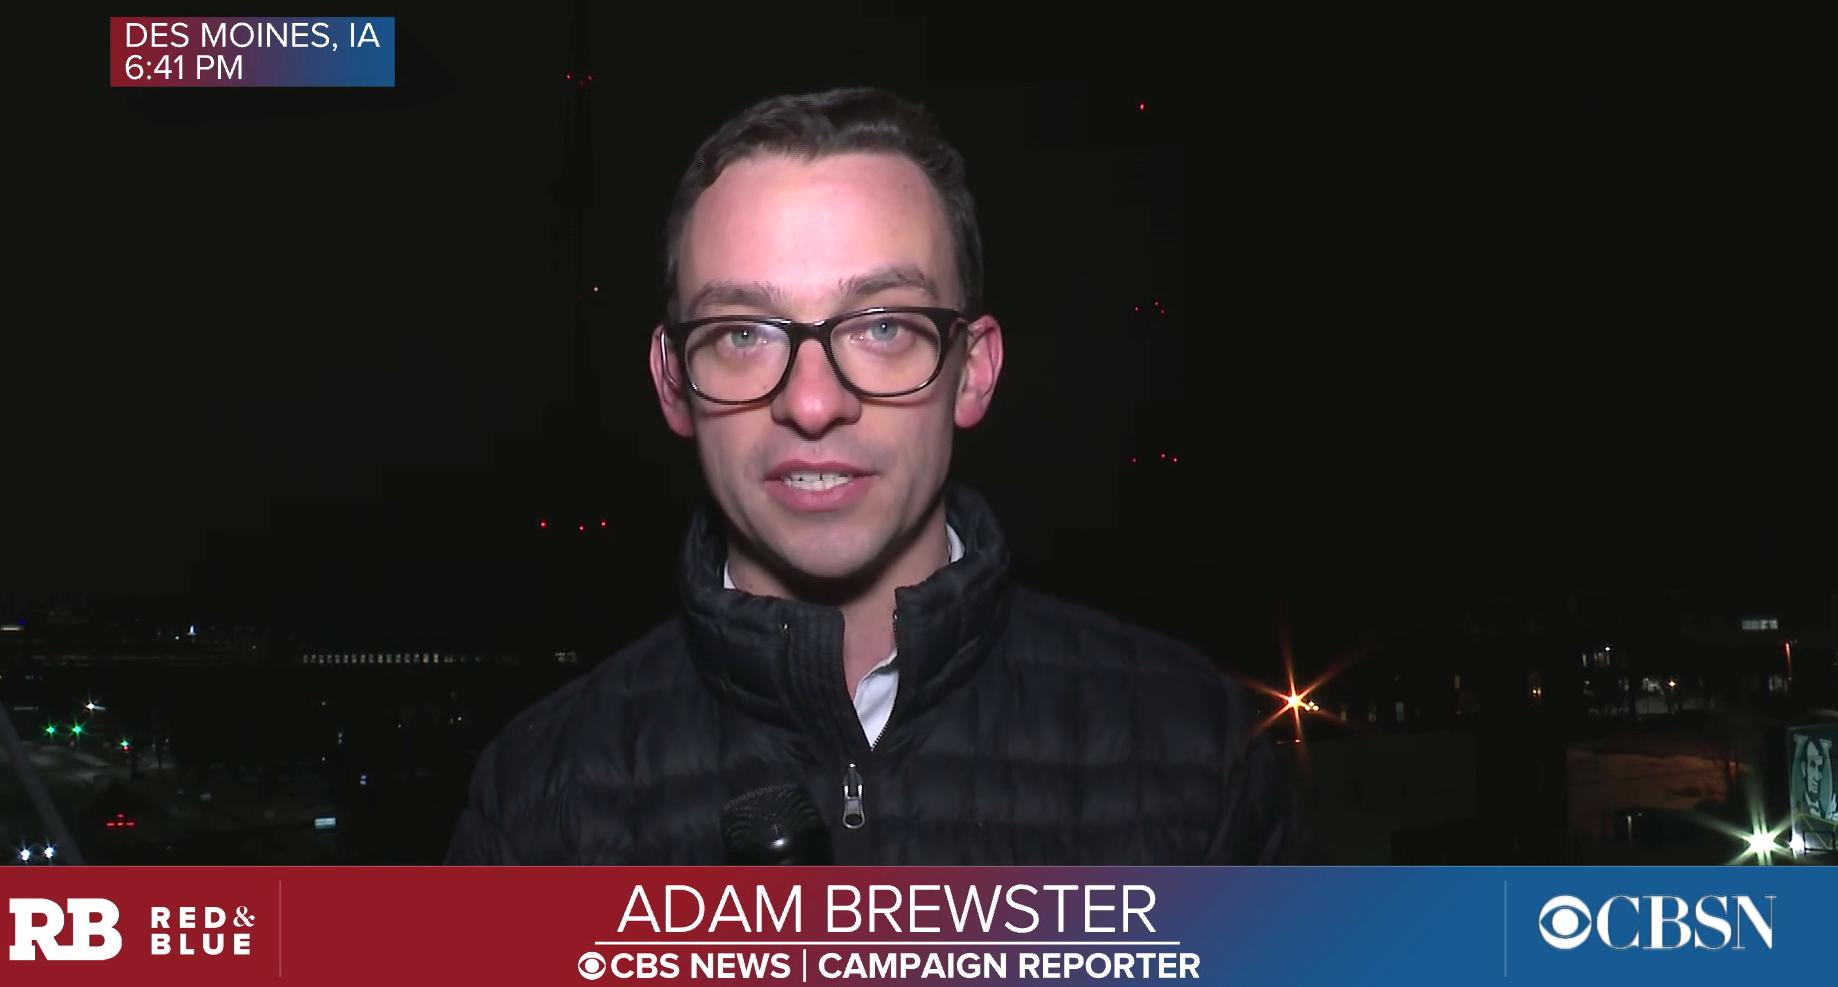 Adam Brewster, BA '12